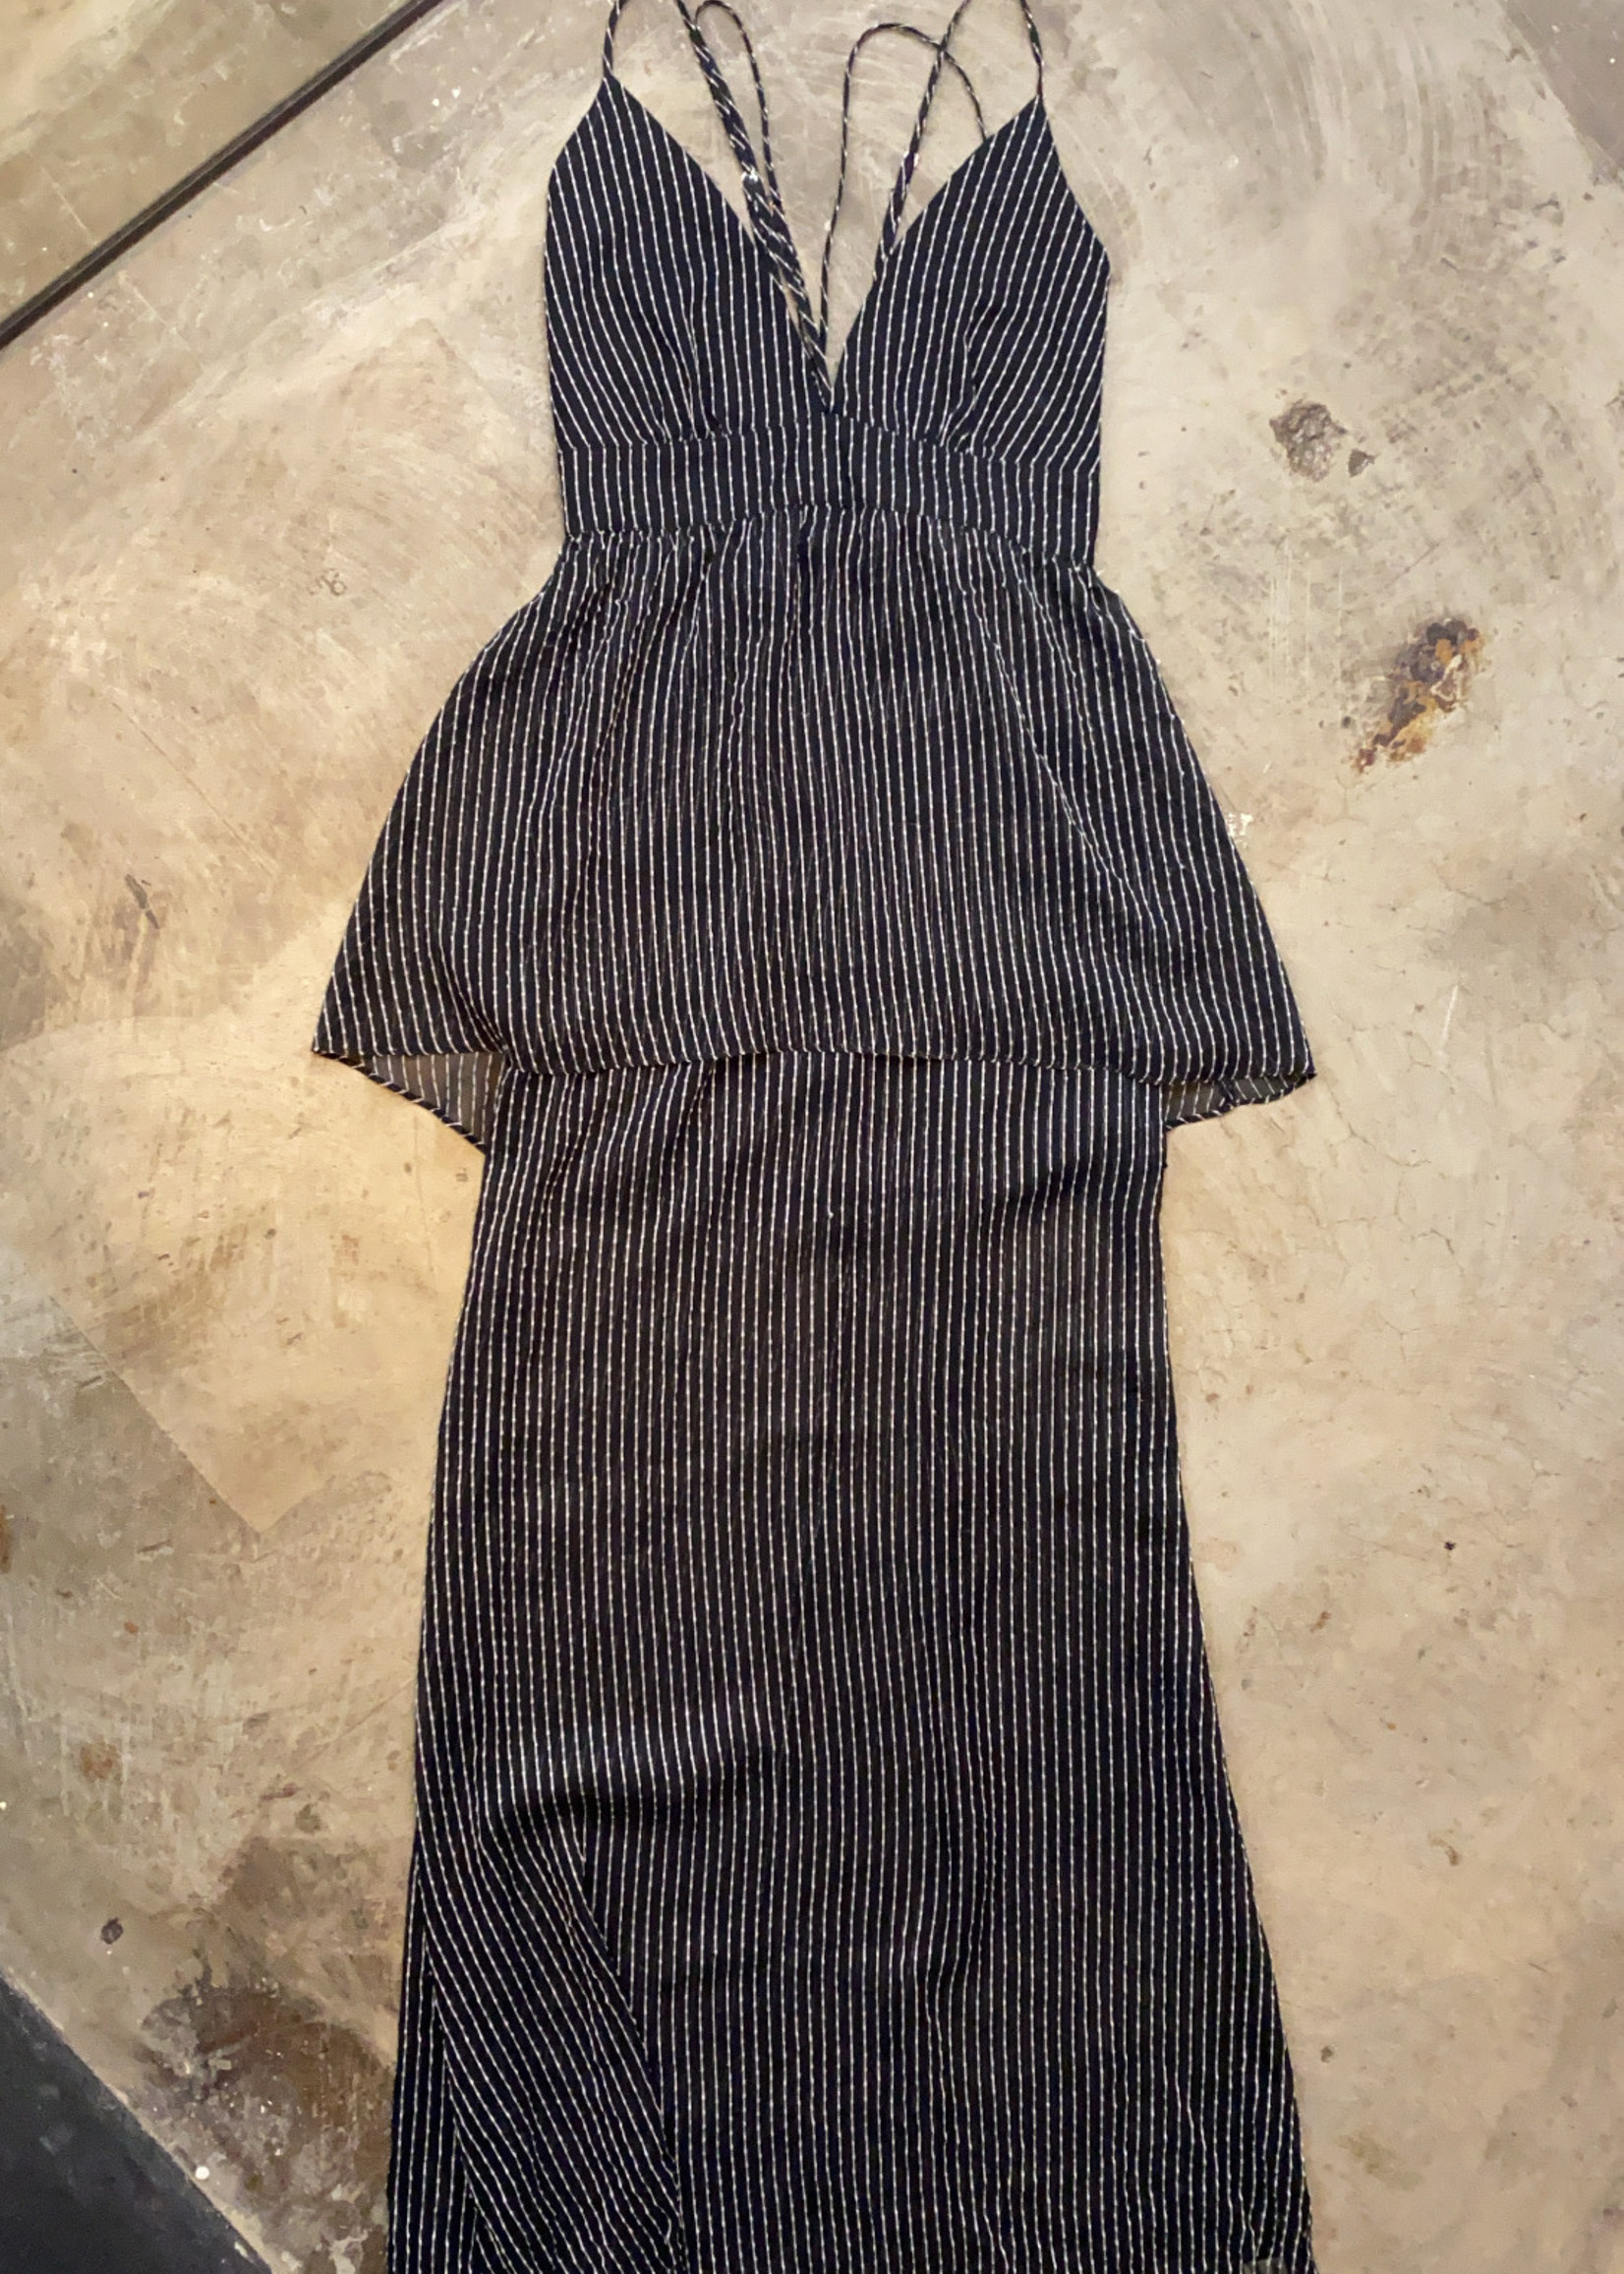 Cold Stone Fox Vintage Black Dress 2